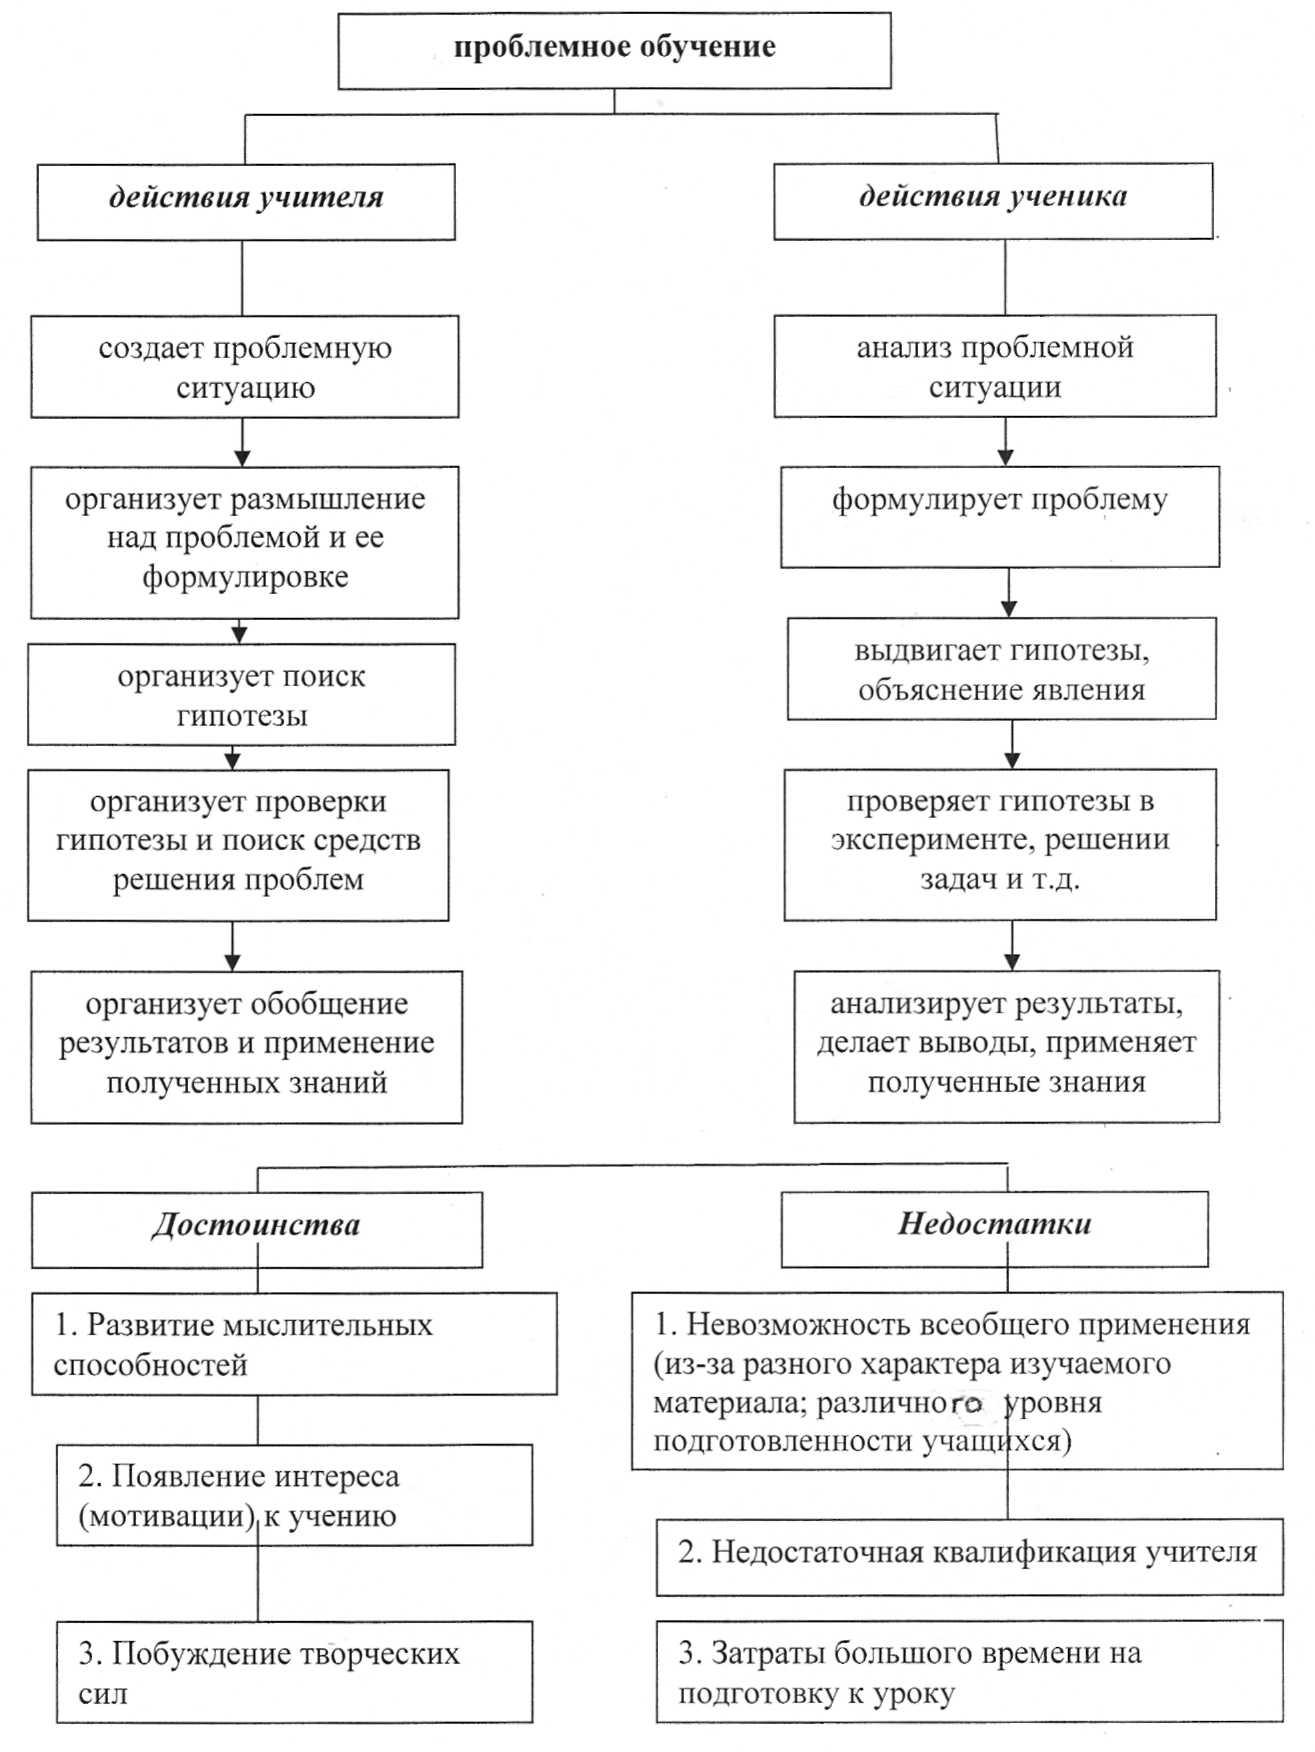 http://lib.gendocs.ru/tw_files2/urls_1362/2/d-1209/1209_html_me495aae.jpg